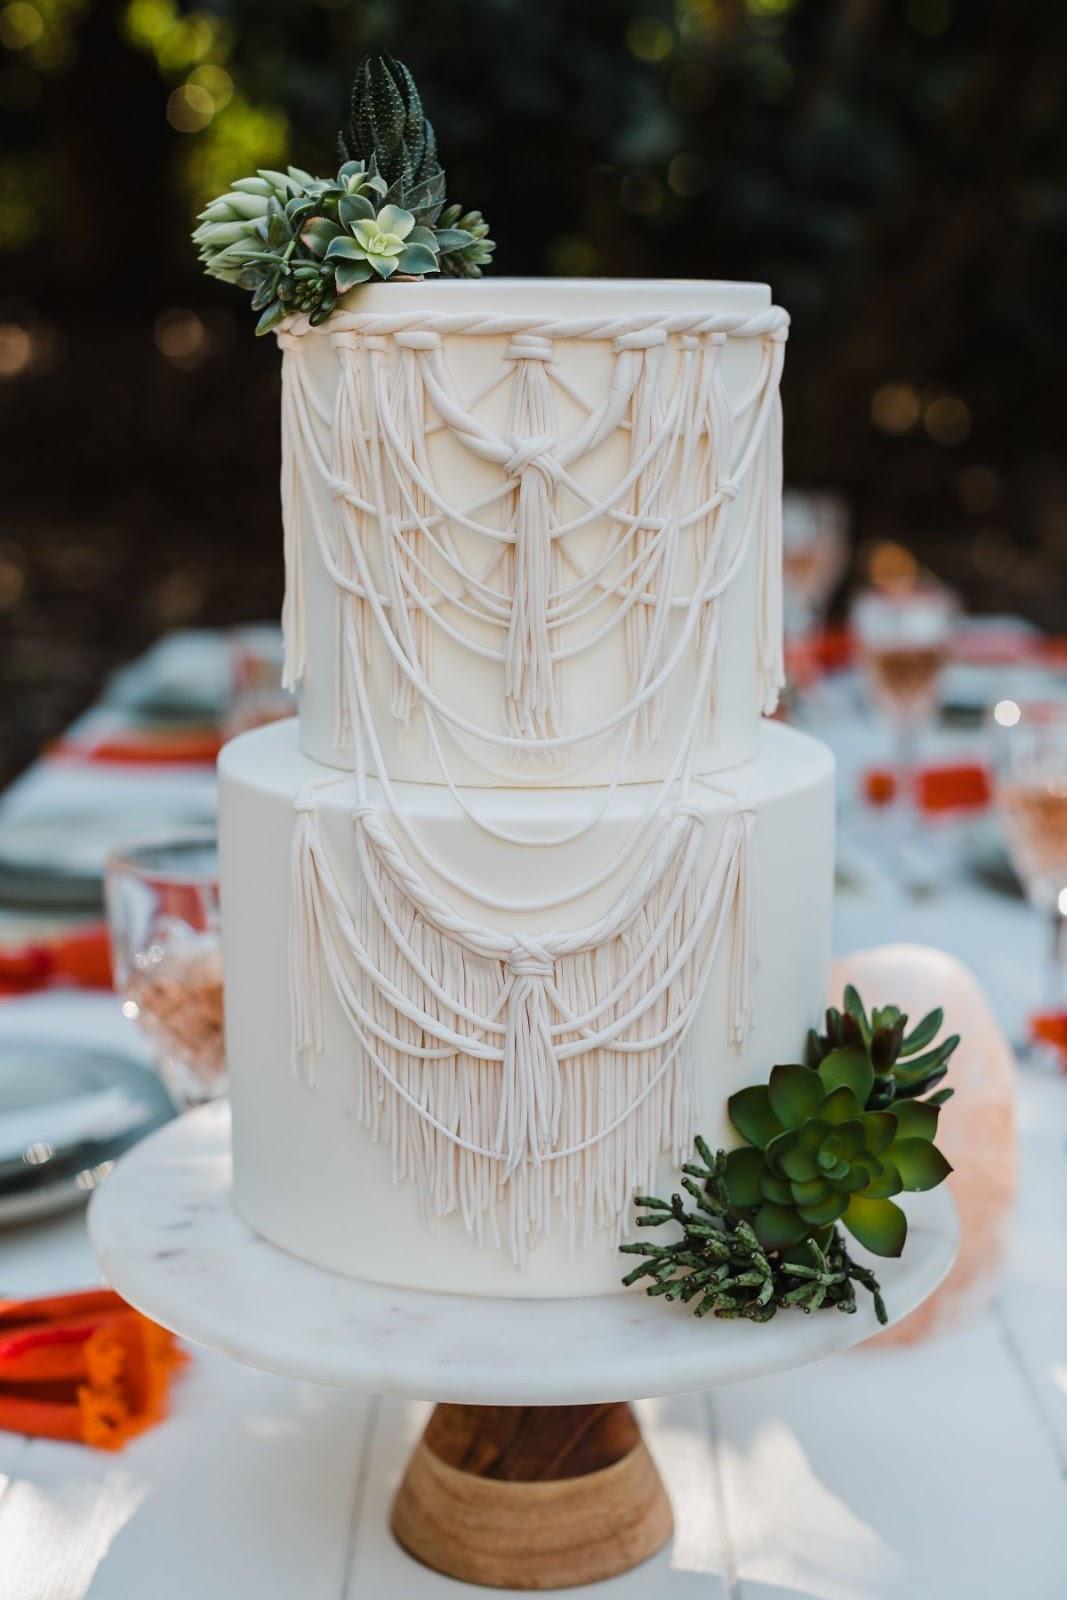 chasing moments photography brisbane wedding cakes designer cake dessert weddings